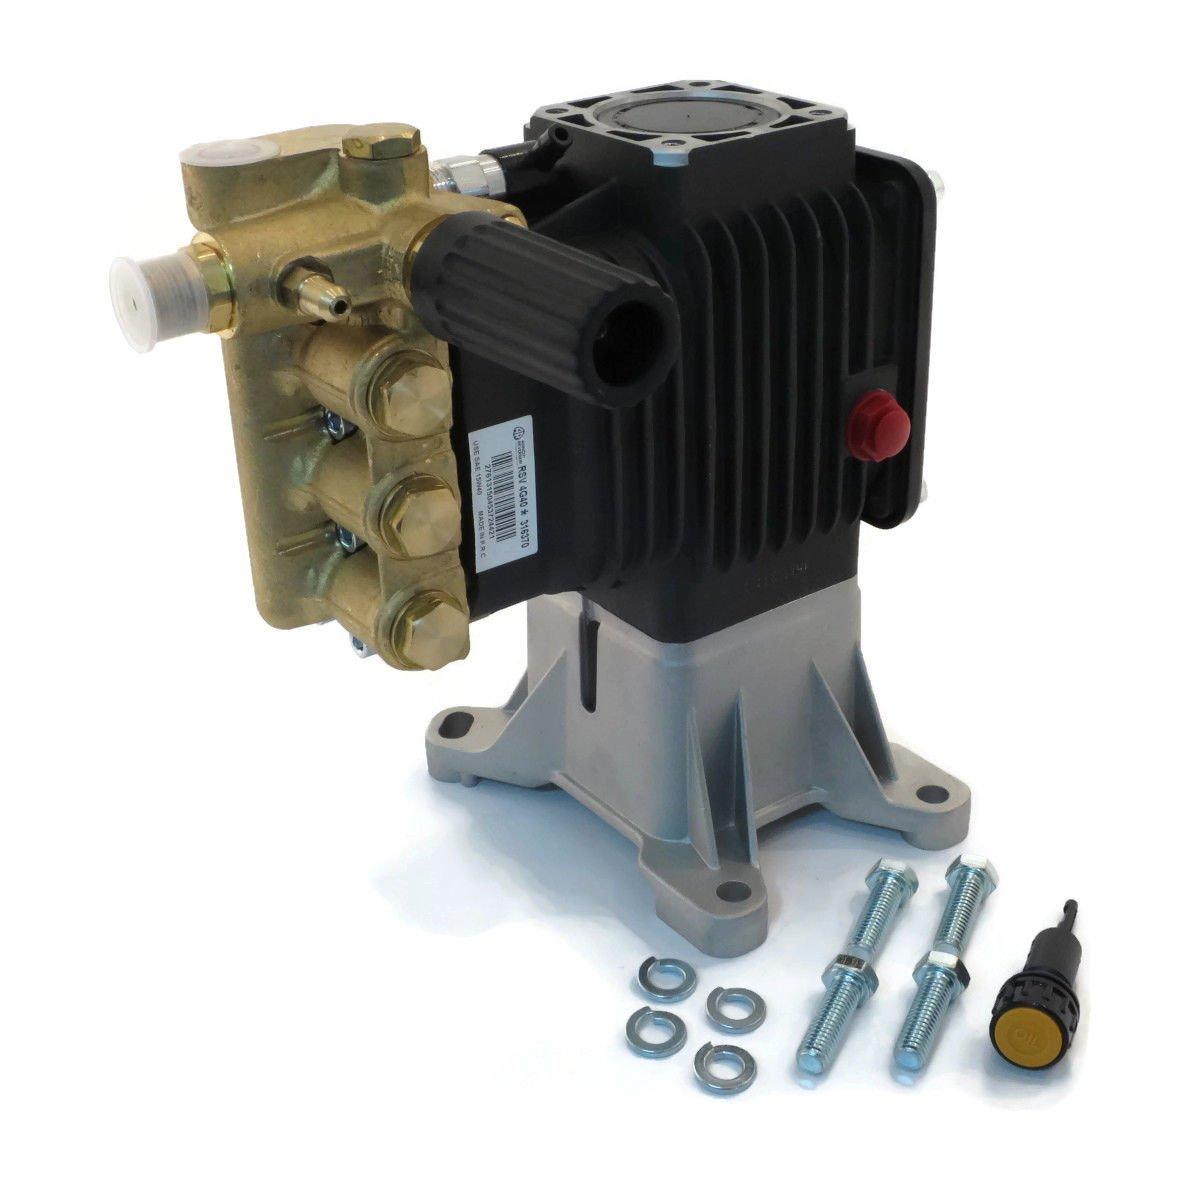 4000 psi PRESSURE WASHER Water PUMP for John Deere PR-4000GH PR-4000GS PR-3400GS by The ROP Shop